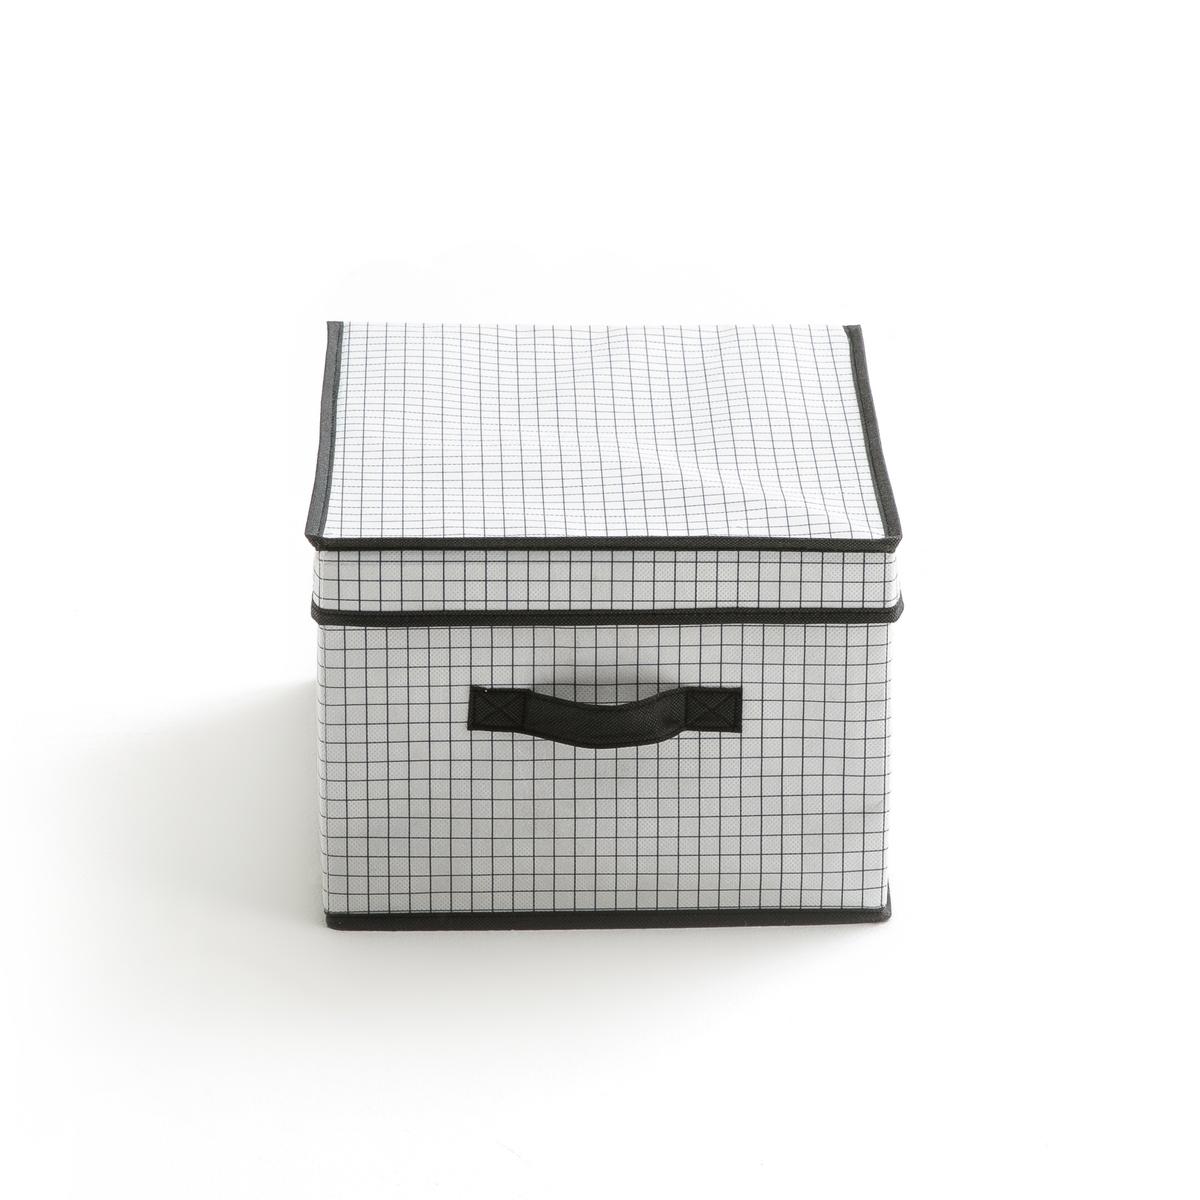 Коробка для вещей TARGA,размер S